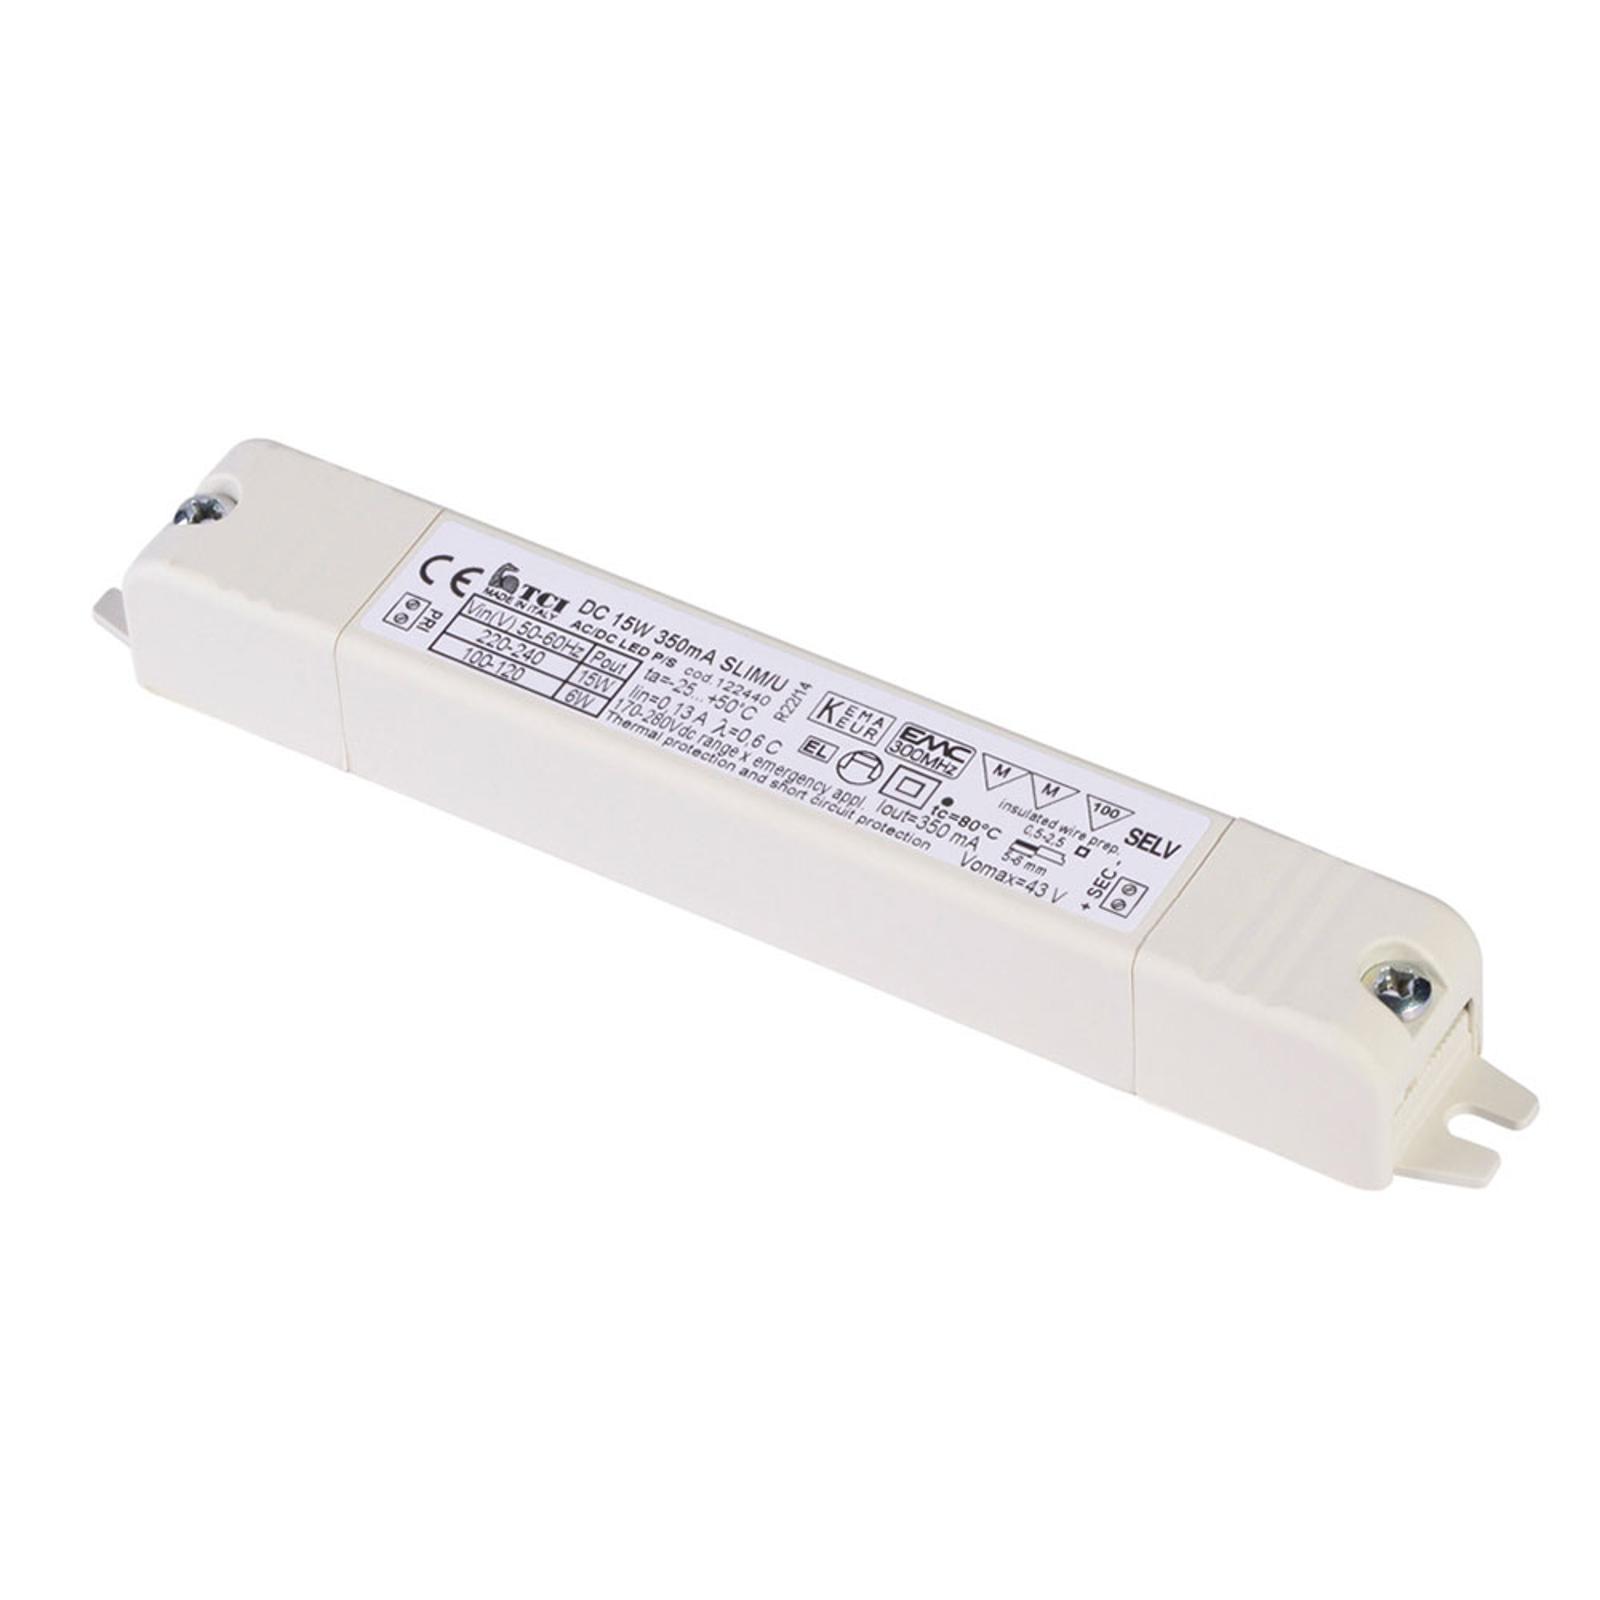 SLV LED-driver 350mA/15W med strekkavlastning